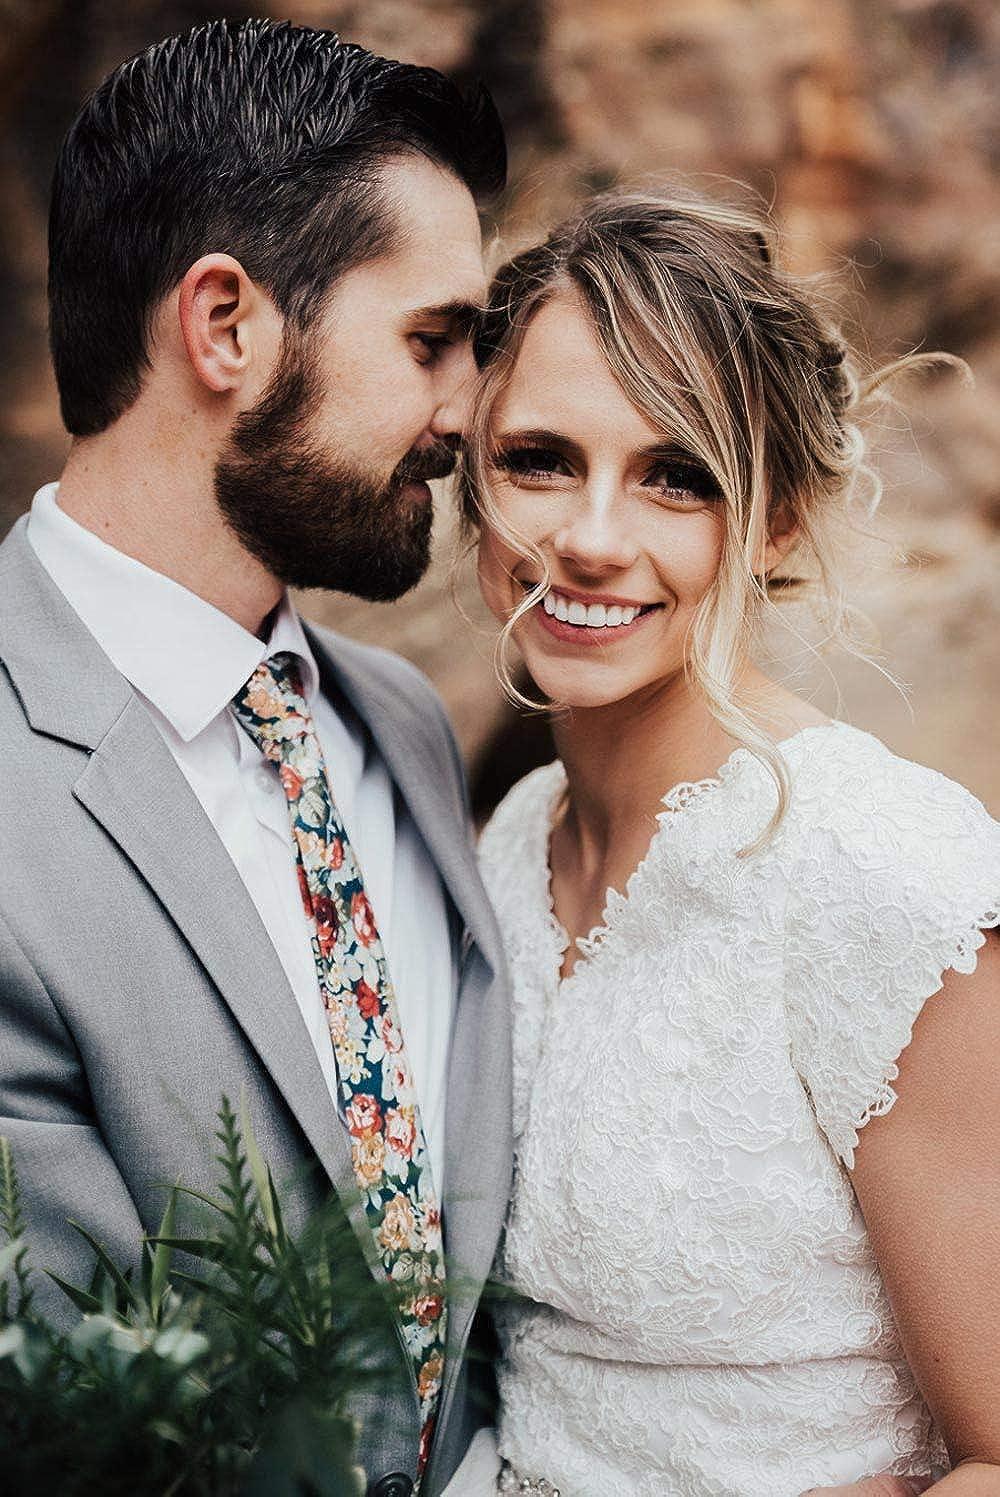 DAZI Men's Skinny Tie Floral Print Cotton Necktie, Great for Weddings, Groom, Groomsmen, Missions, Dances, Gifts. (Mardi) : Clothing, Shoes & Jewelry